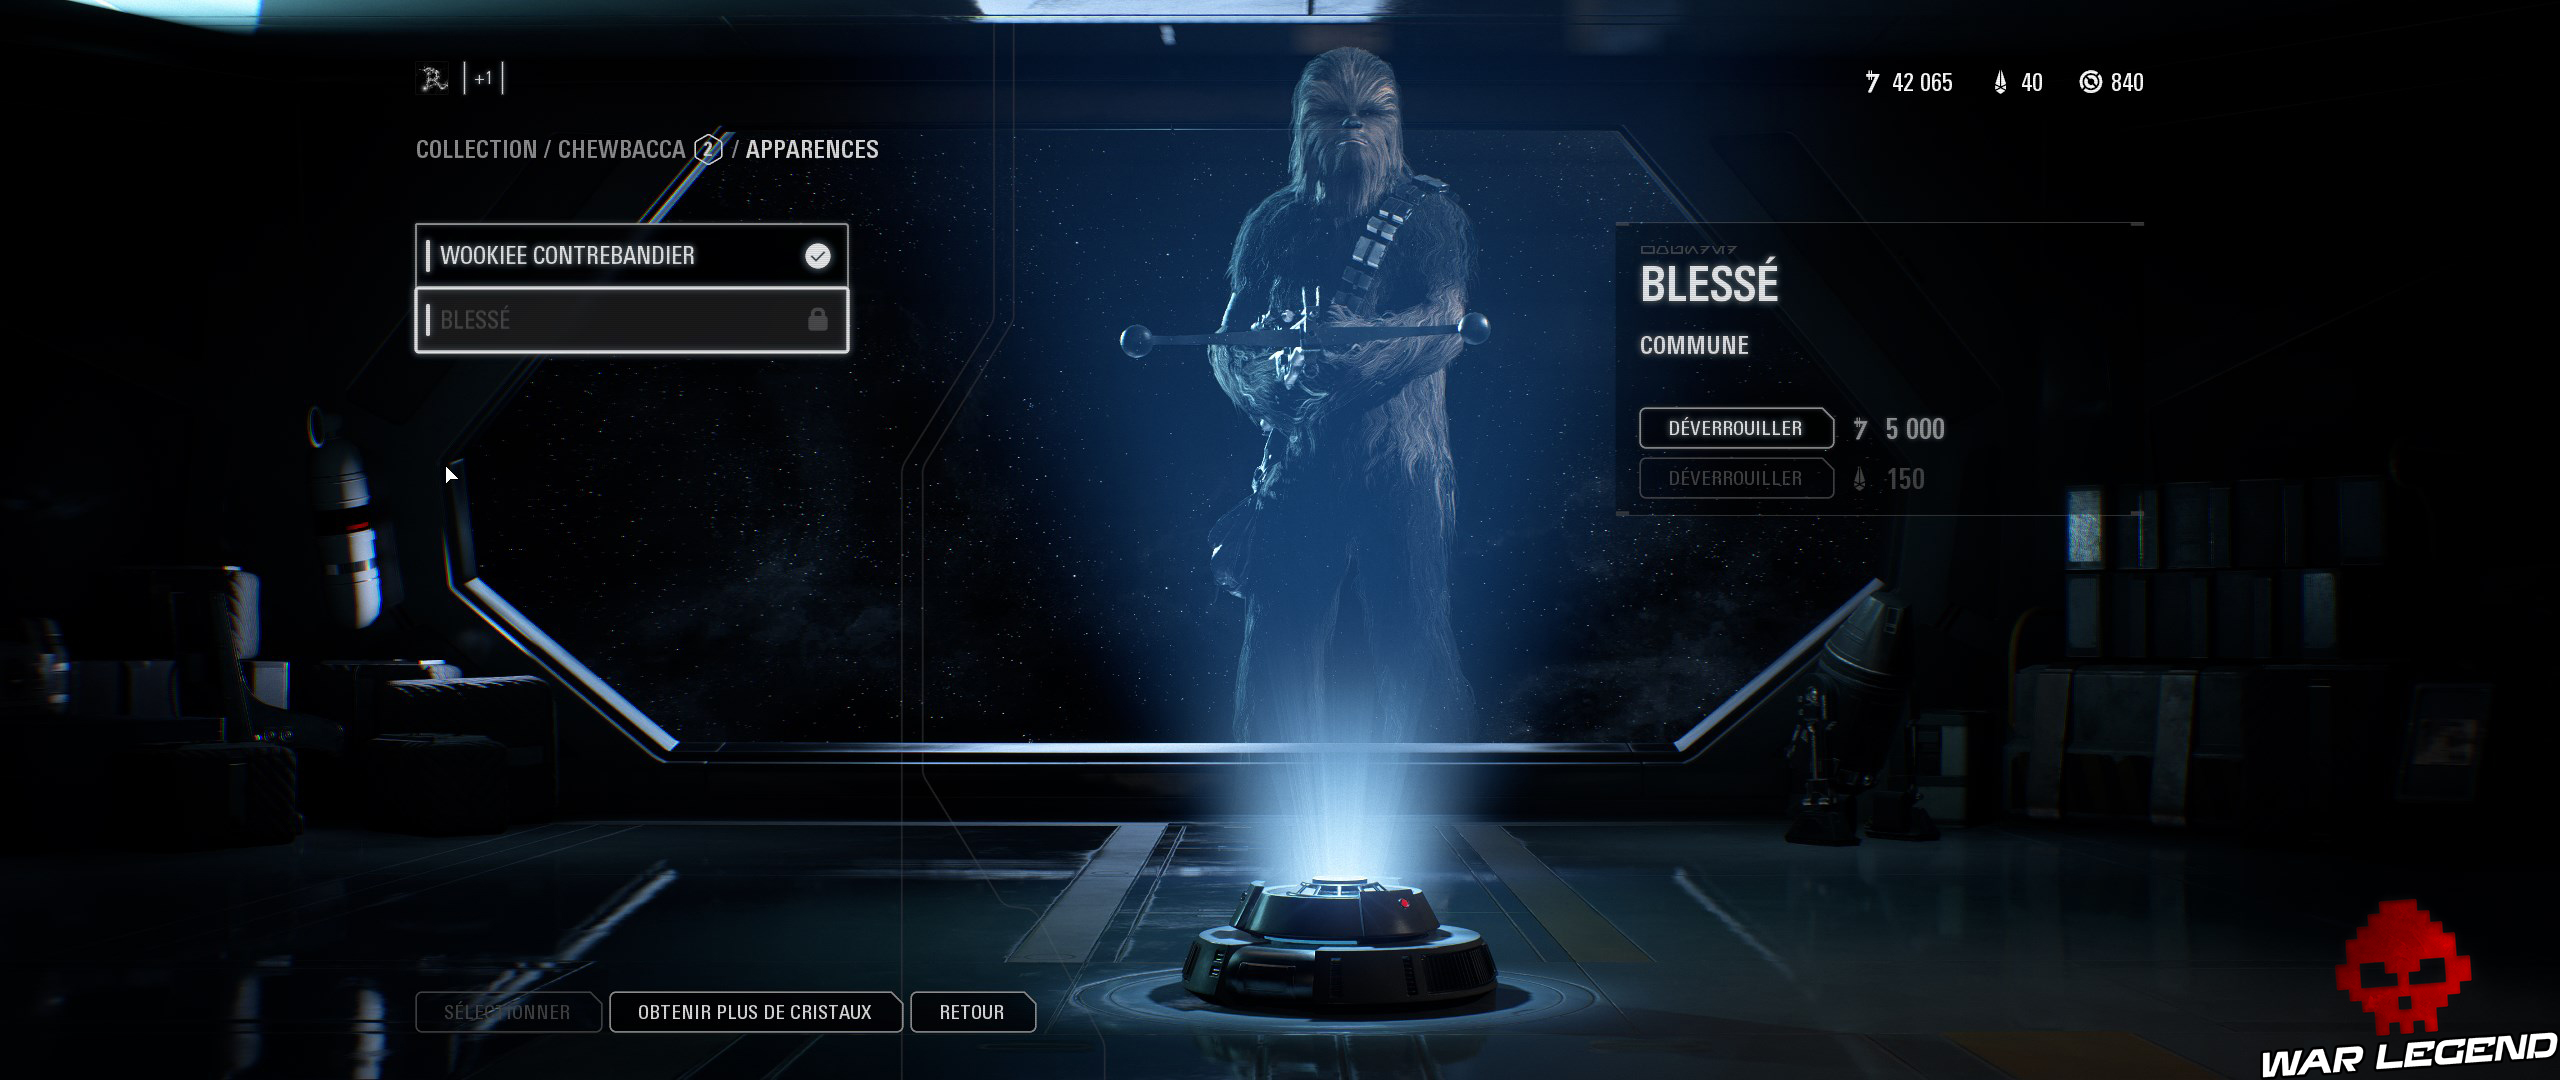 ReTest Star Wars Battlefront II skin chewbacca blessé